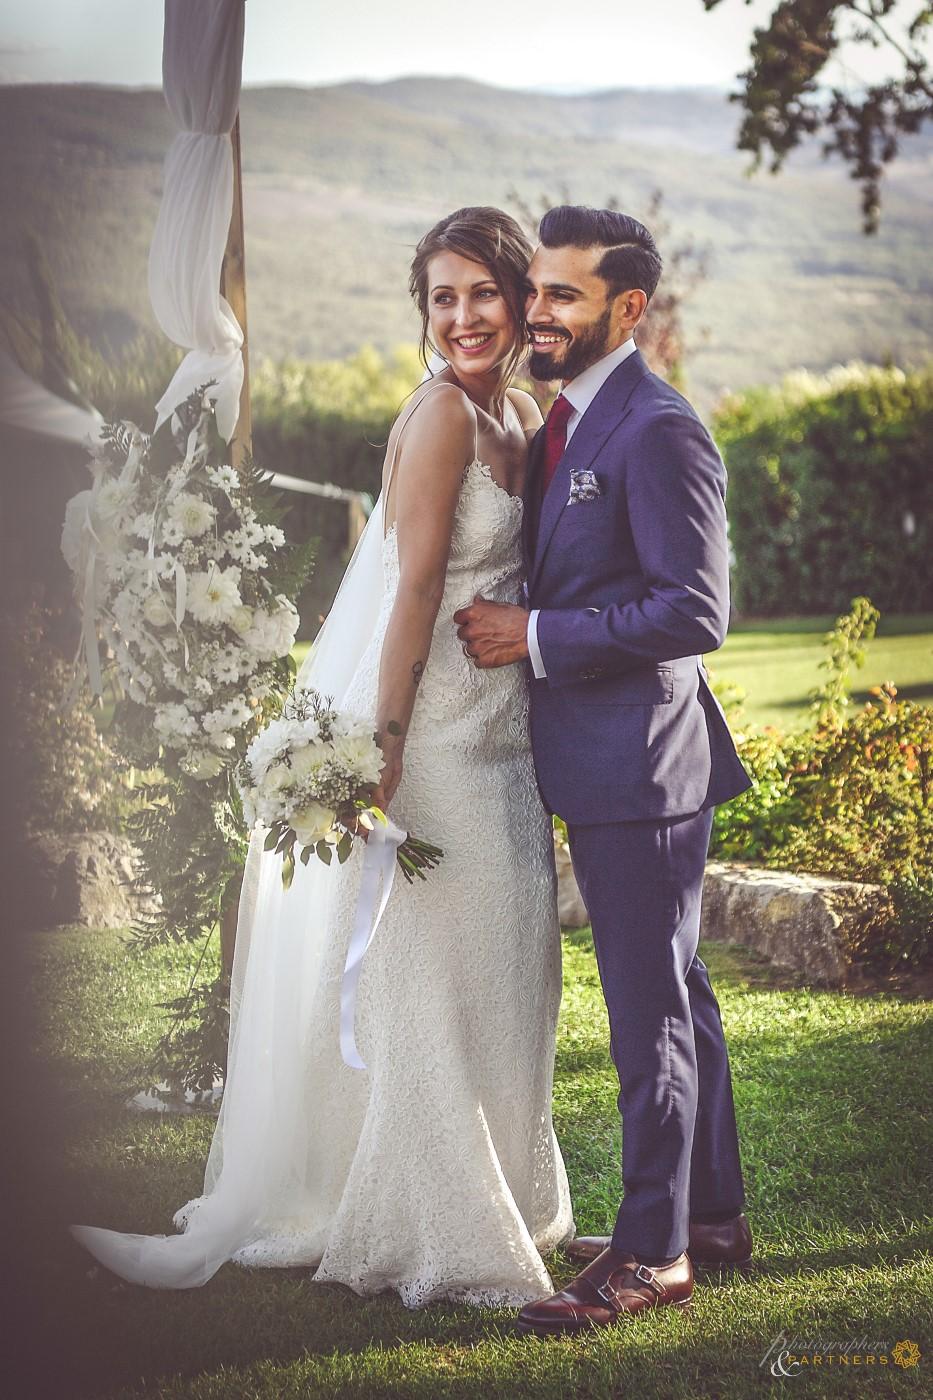 wedding_photos_tenuta_quadrifoglio_12.jpg